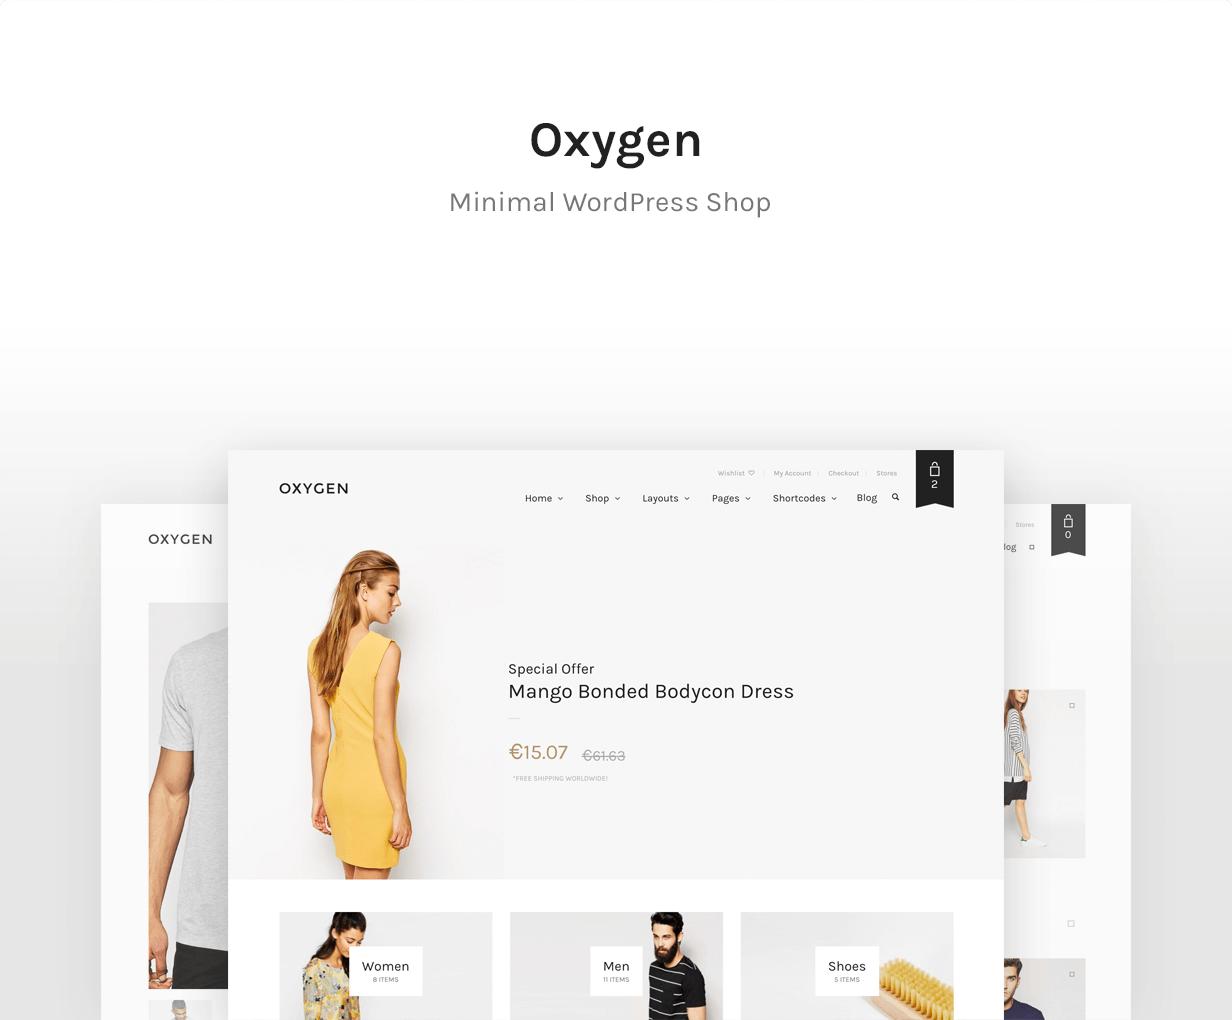 Sauerstoff - Bestes WooCommerce-Thema